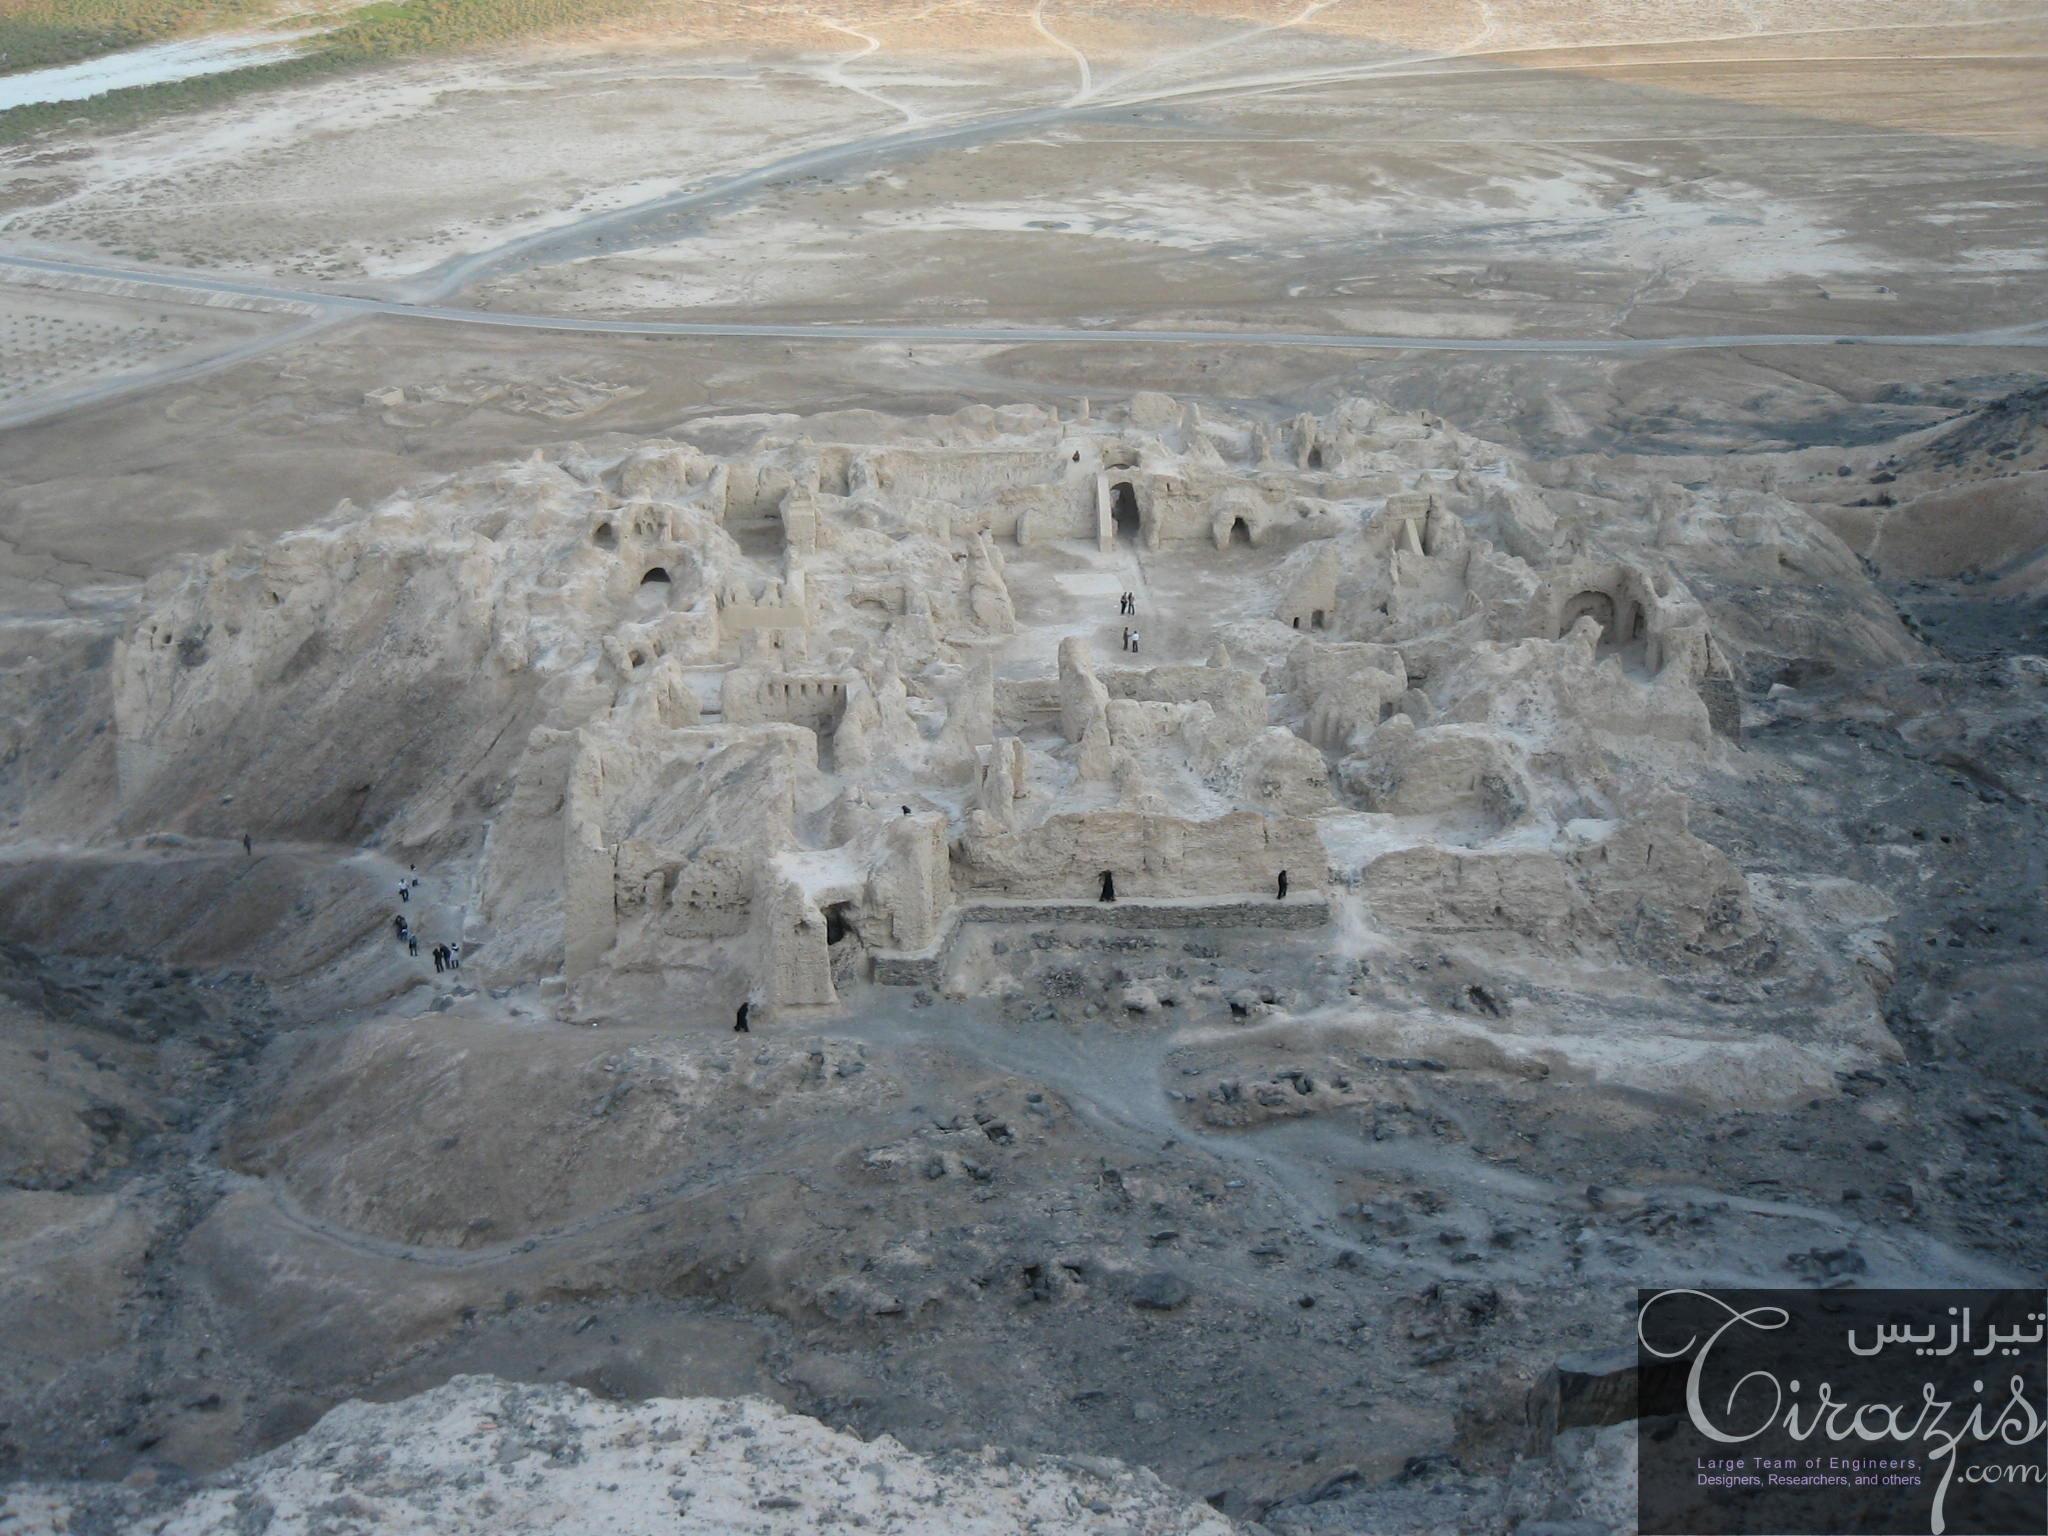 اقلیم سیستان و بلوچستان